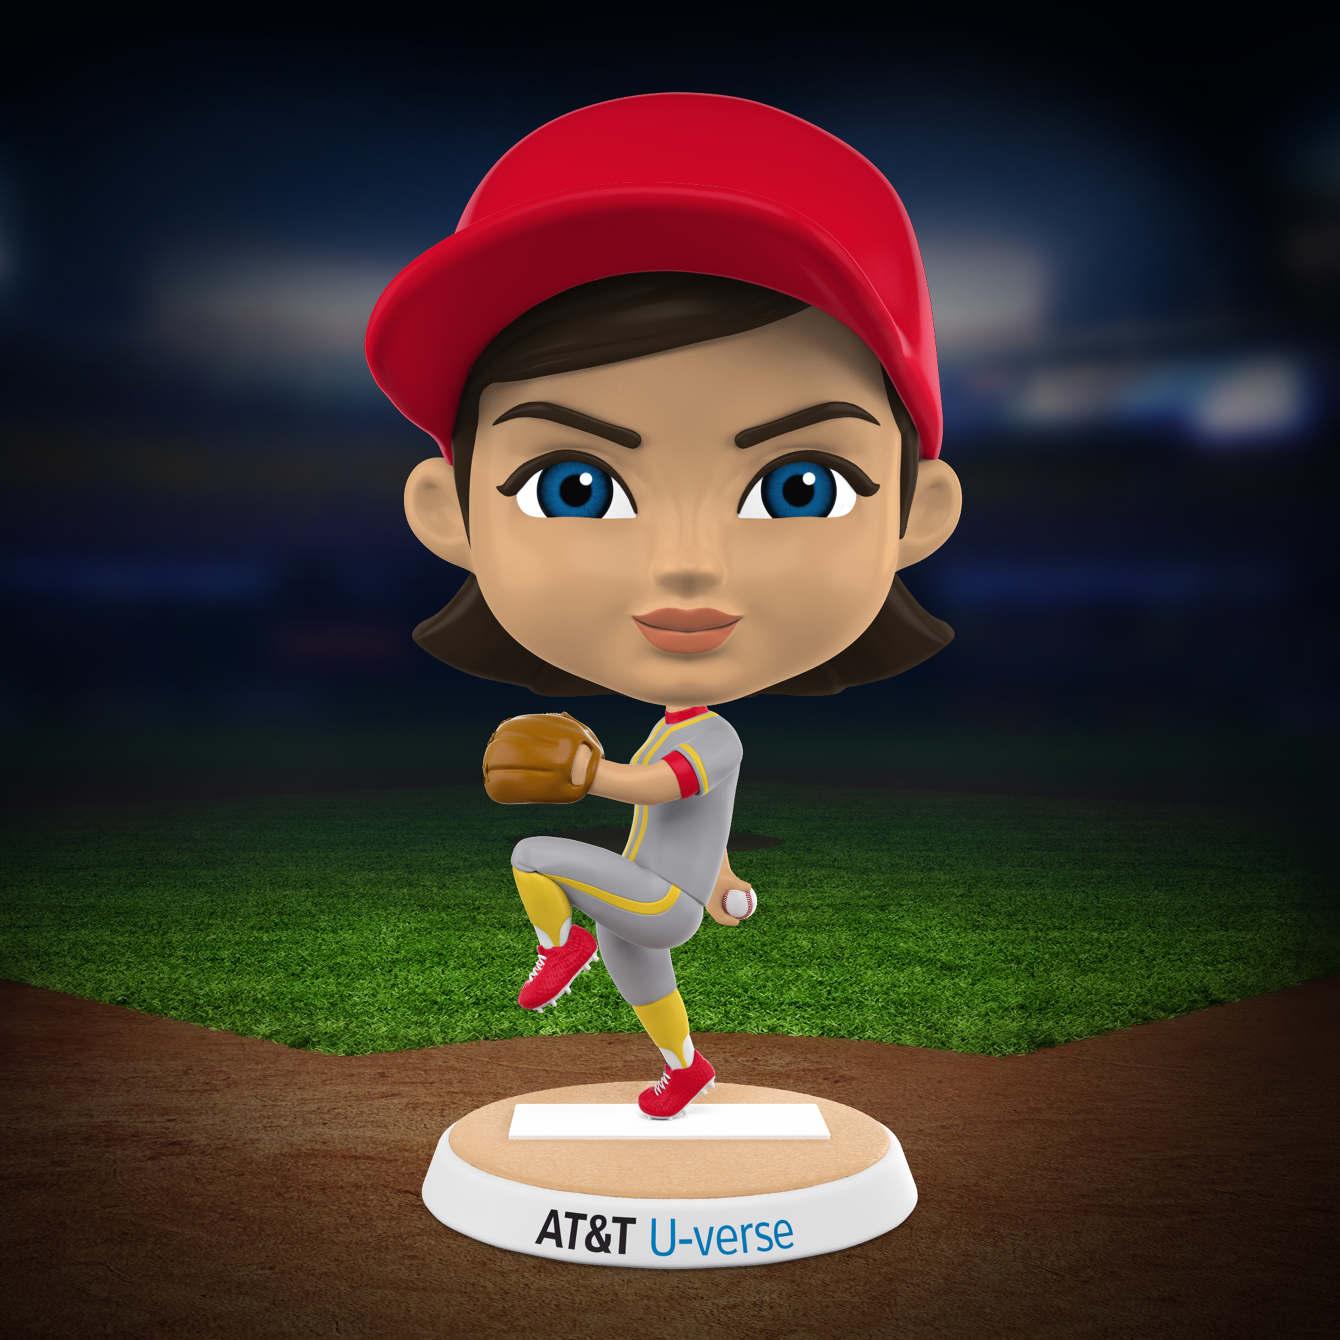 ATT-U-verse-Bobbleheads-baseball_w_1340_c.jpg